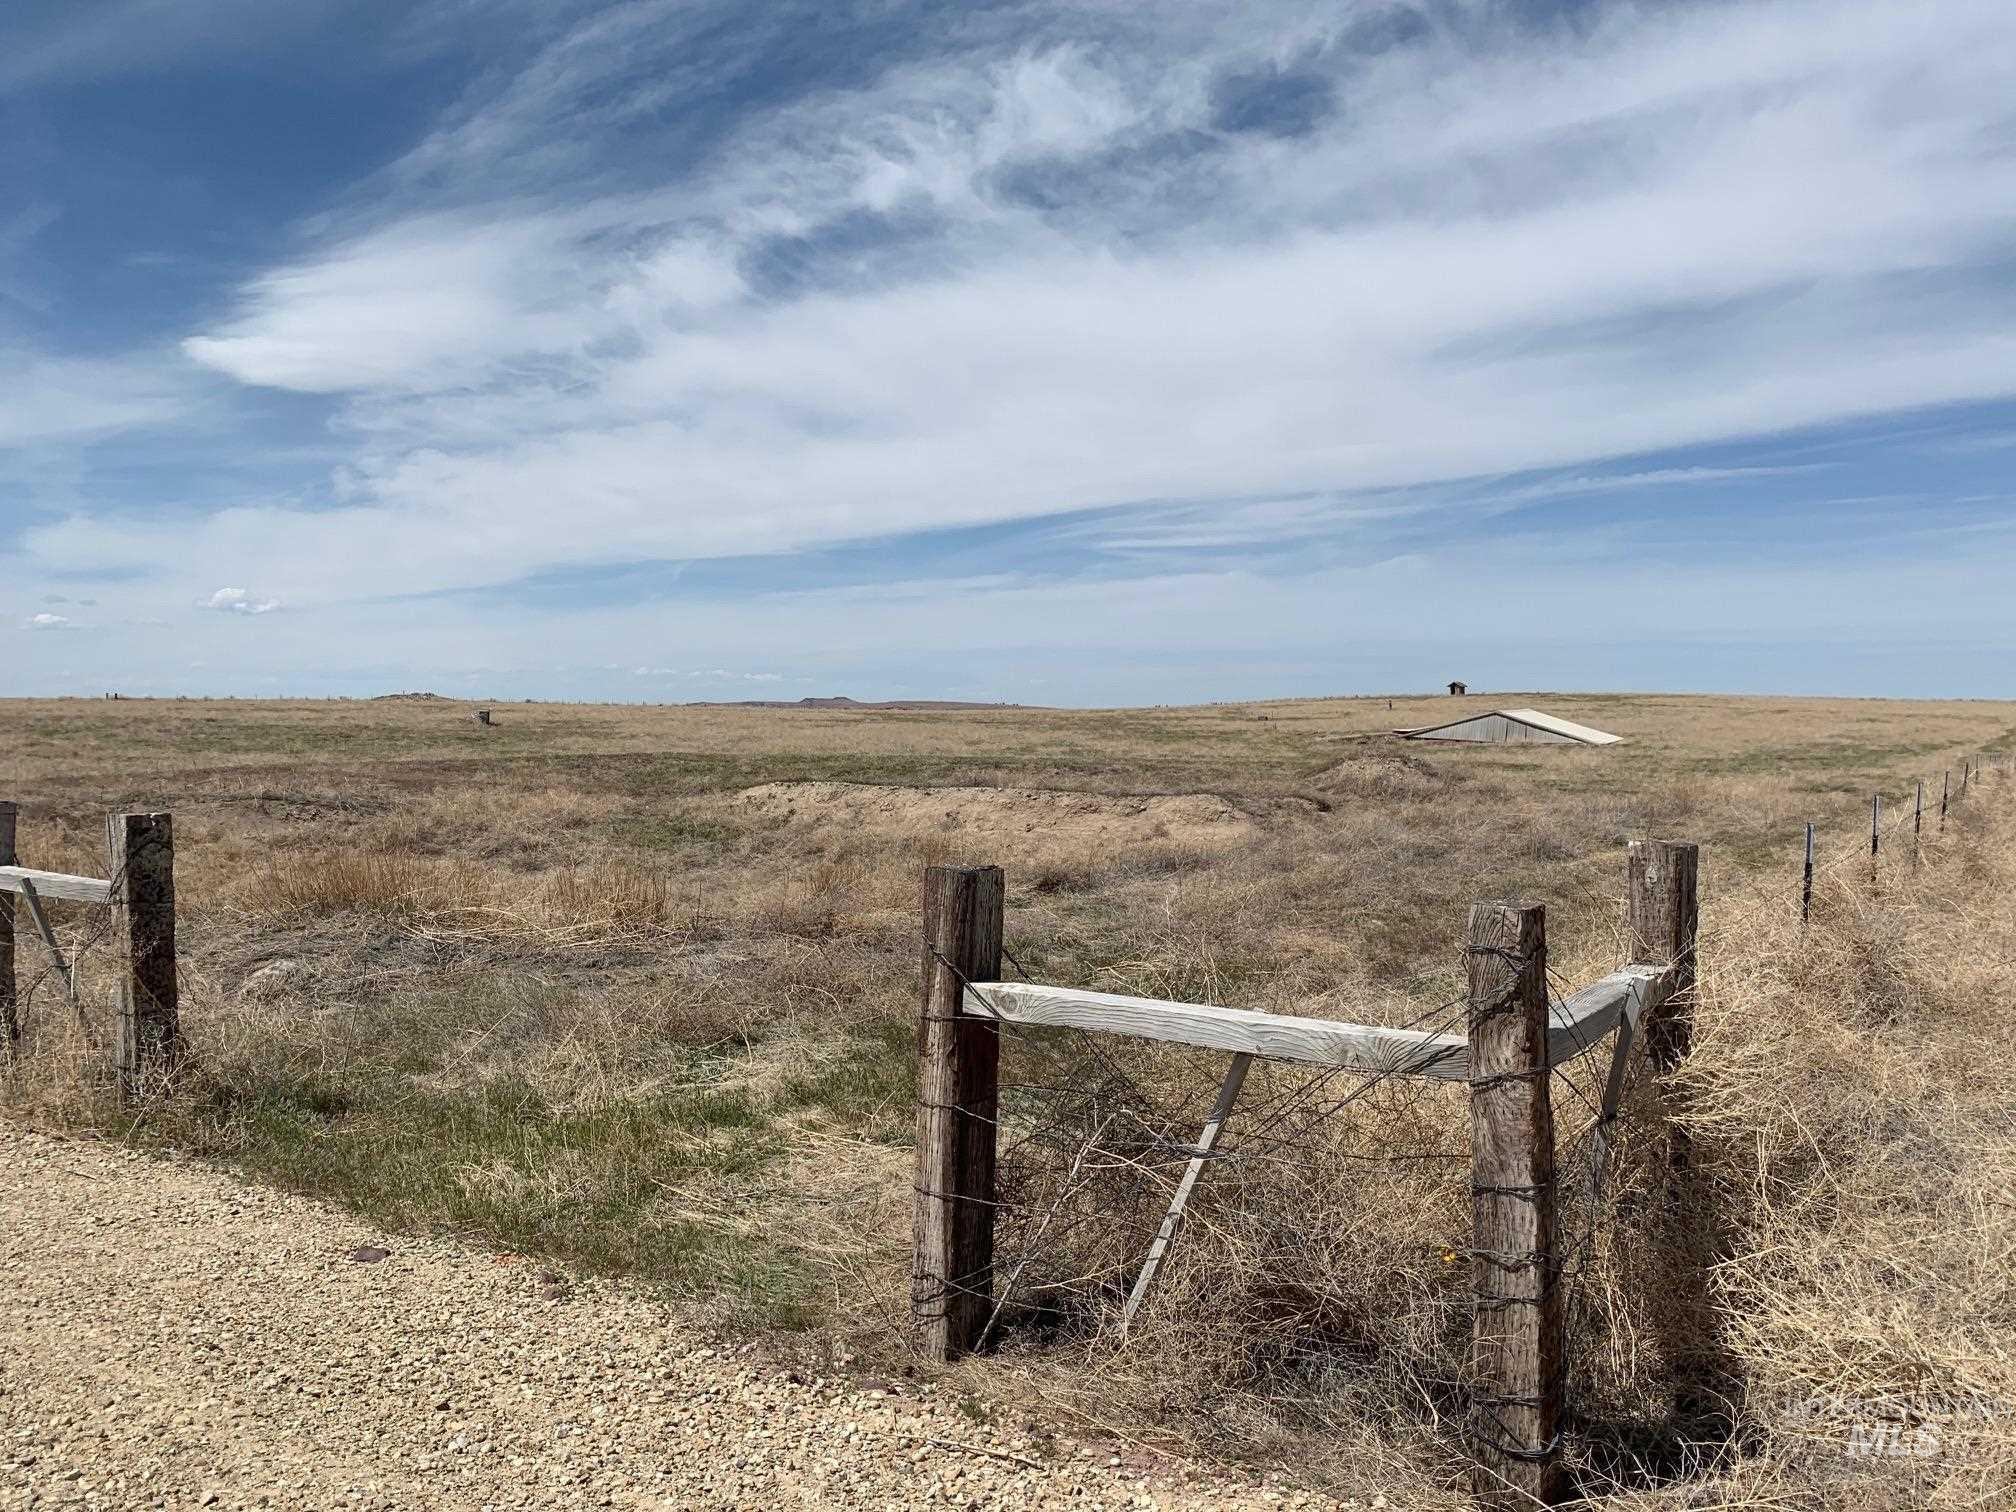 Tbd Sky Ranch - Stage Coach Roads Property Photo 1